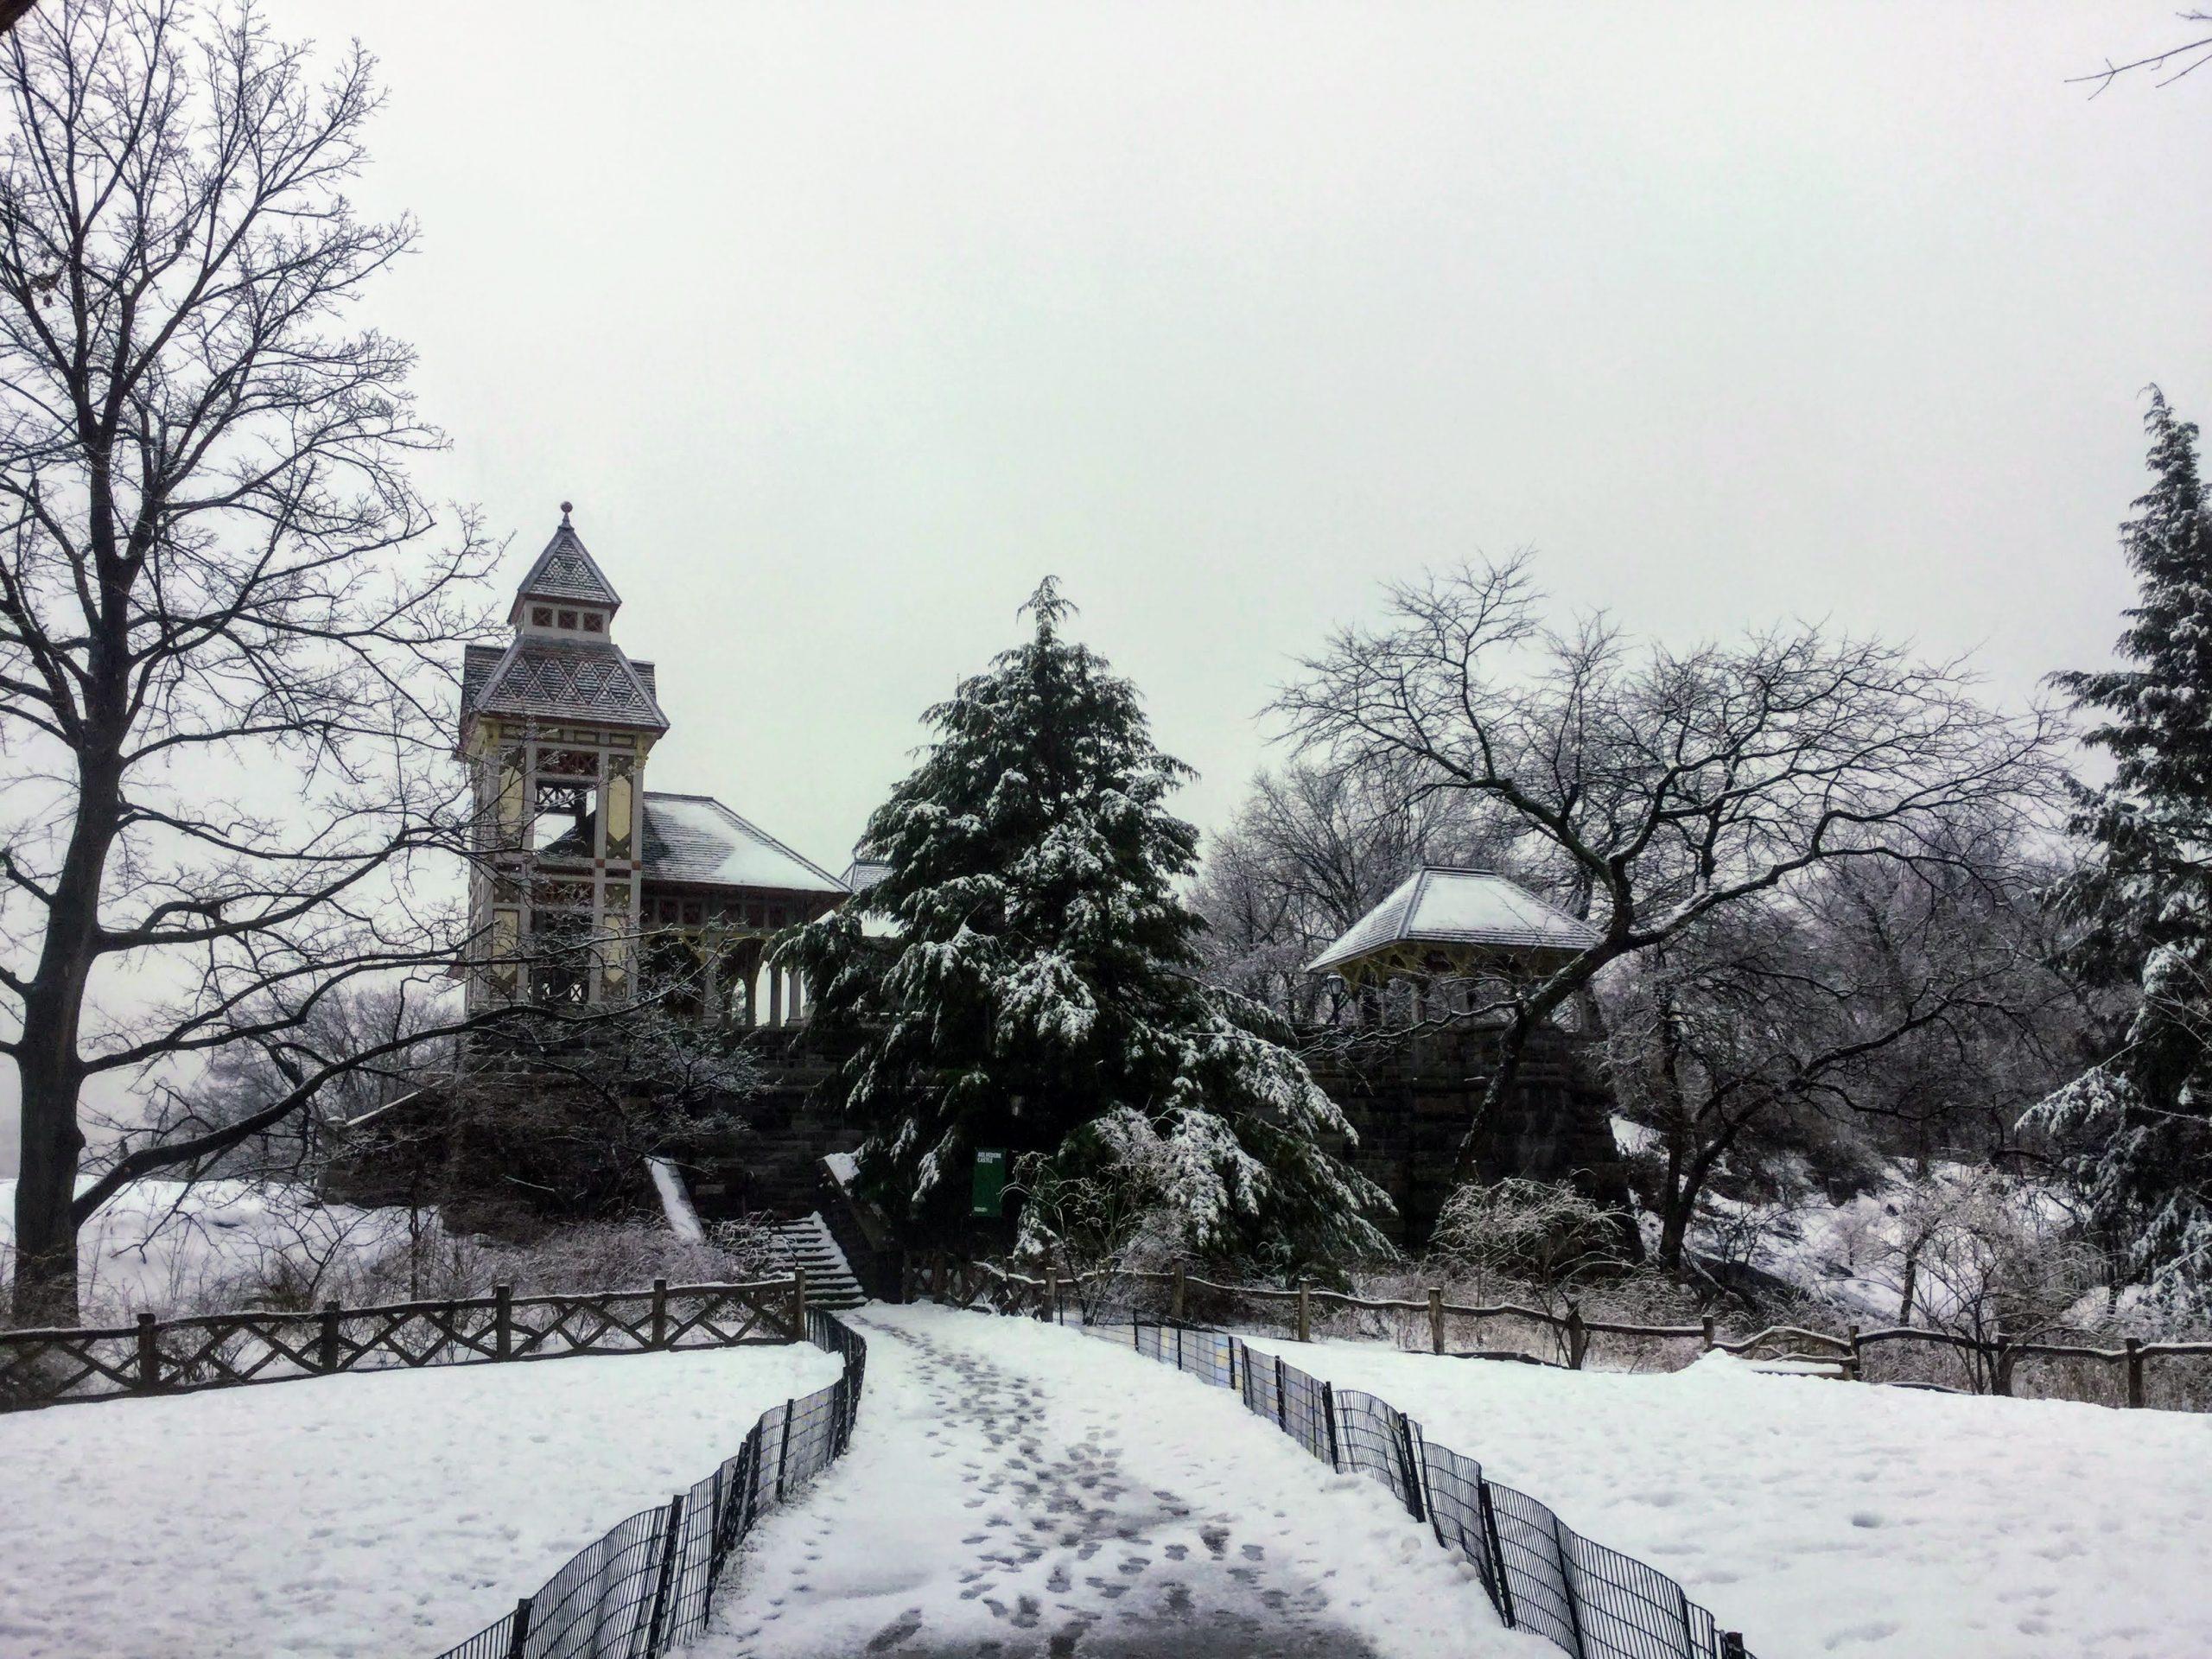 Belvedere Castle in the Snow